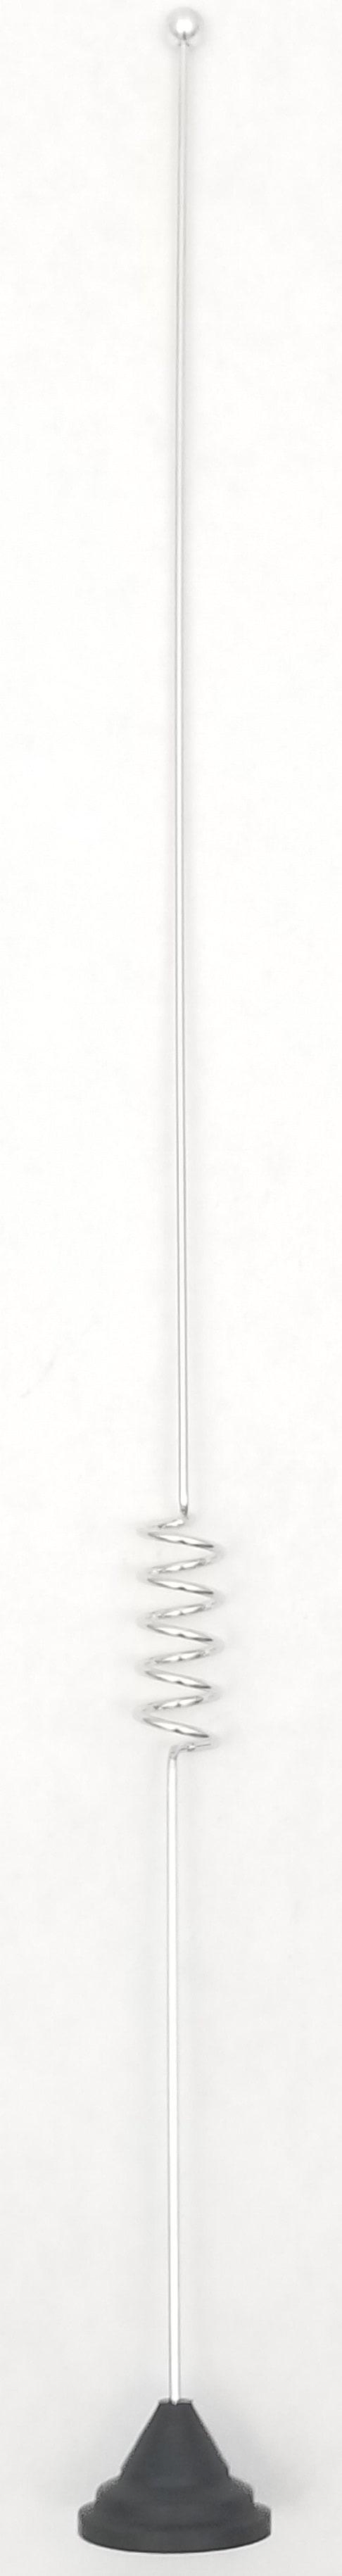 MUF8063 - Maxrad 806-866Mhz 3Db 150 Watt Antenna Only